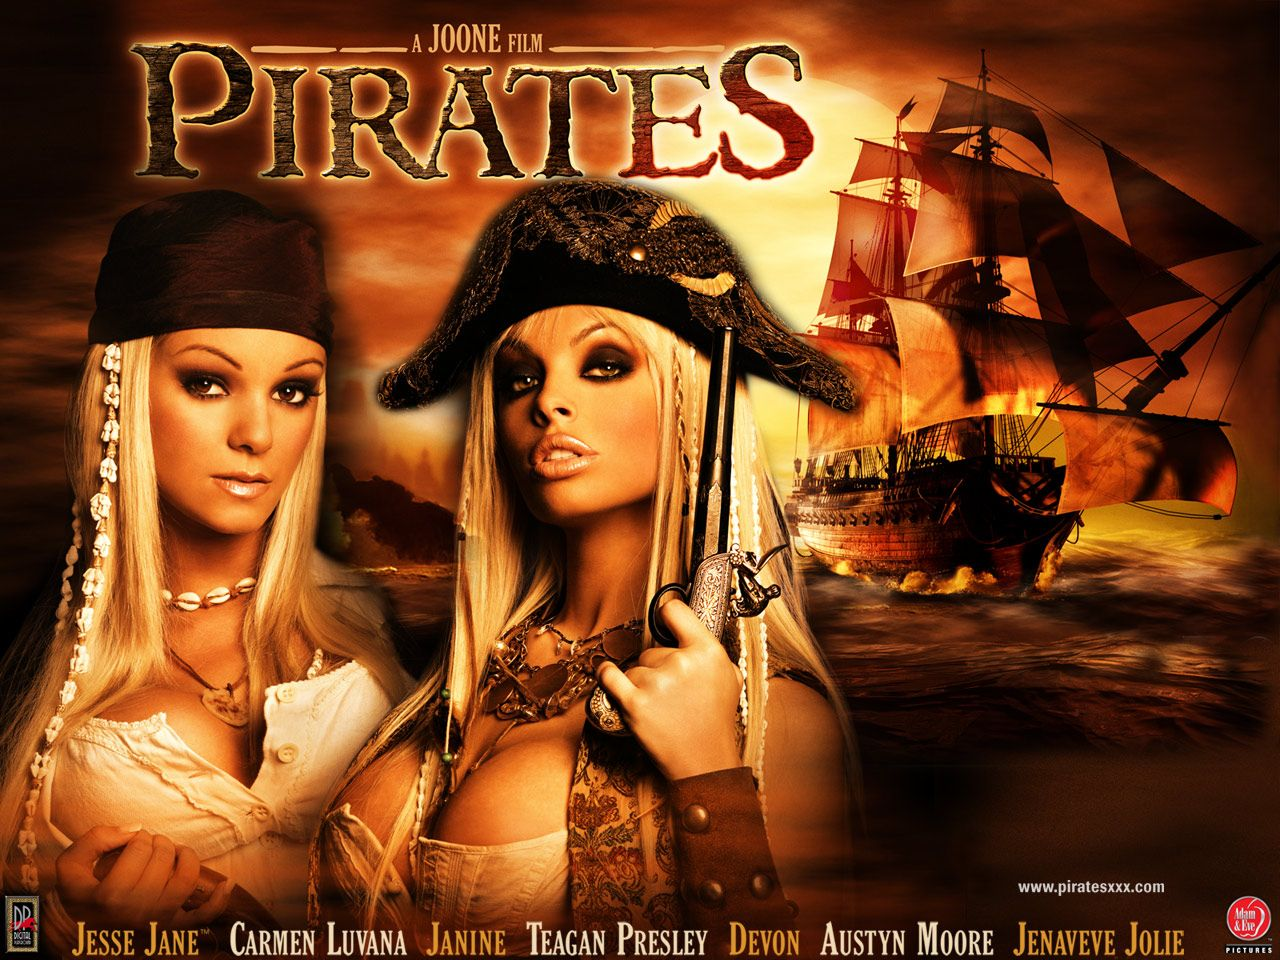 Digital playground pirates 1